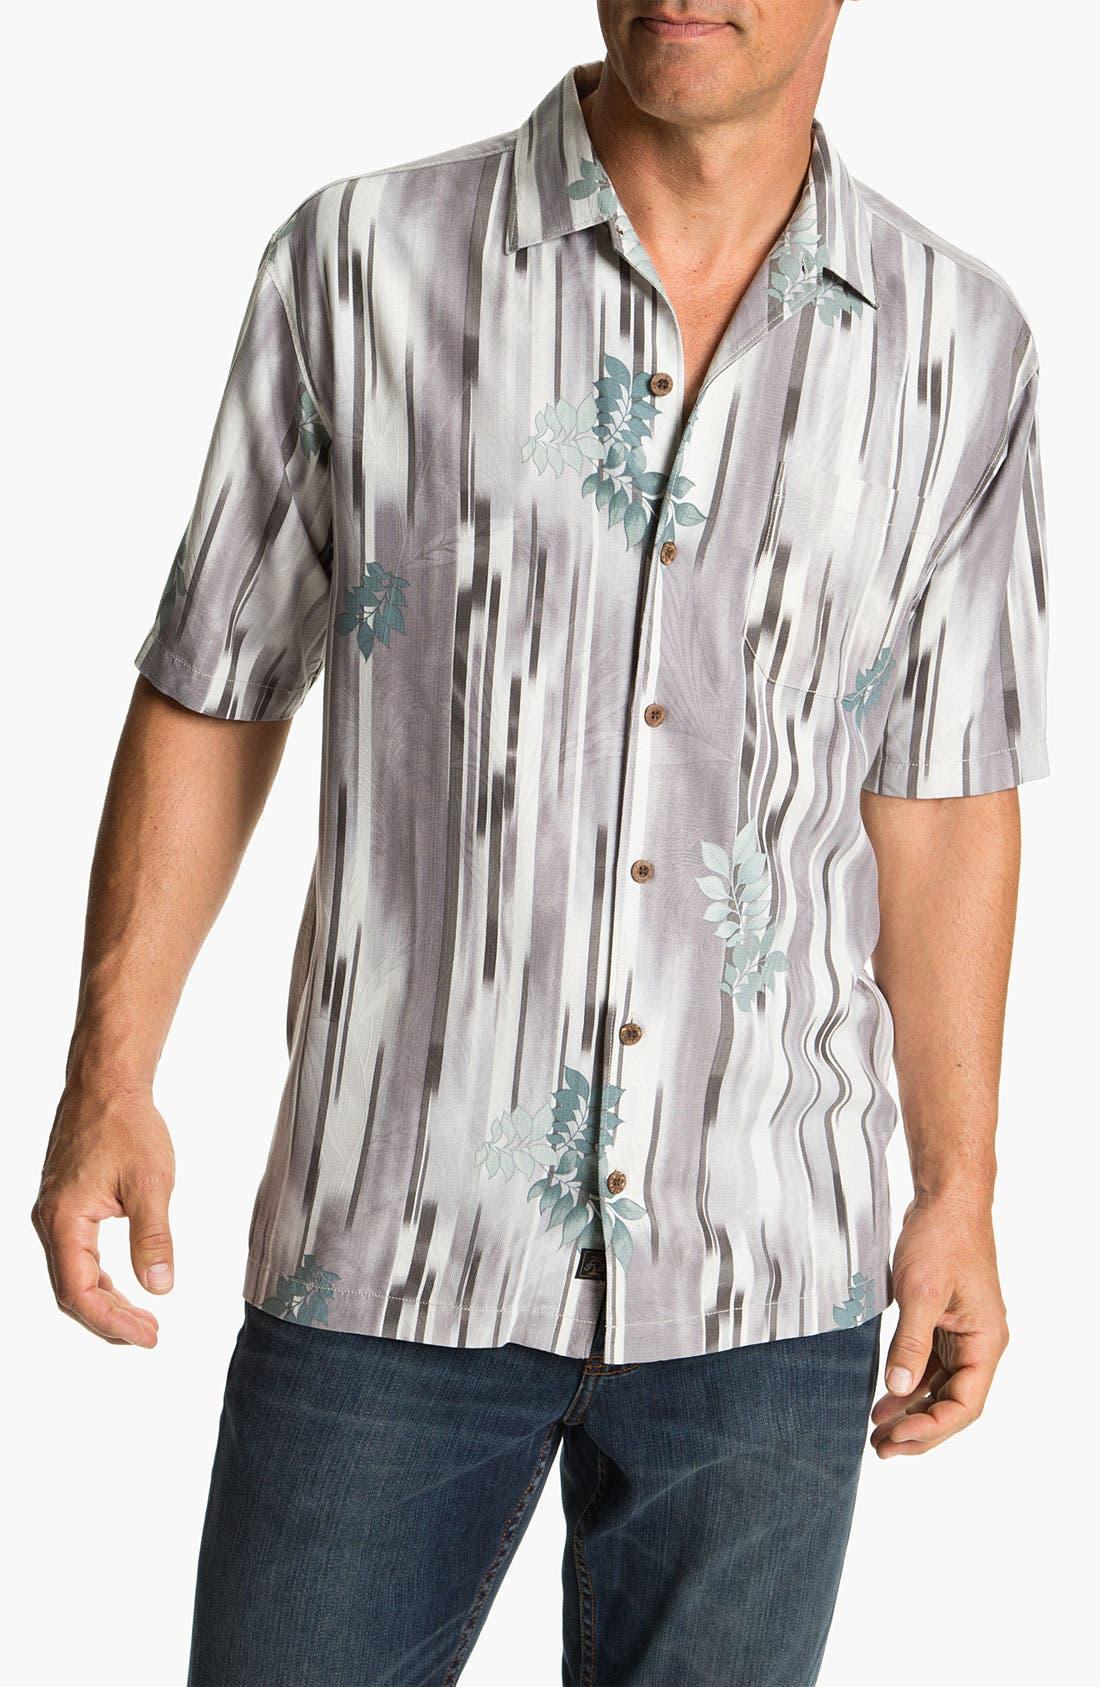 Alternate Image 1 Selected - Tommy Bahama 'Lemongrass Ikat' Silk Campshirt